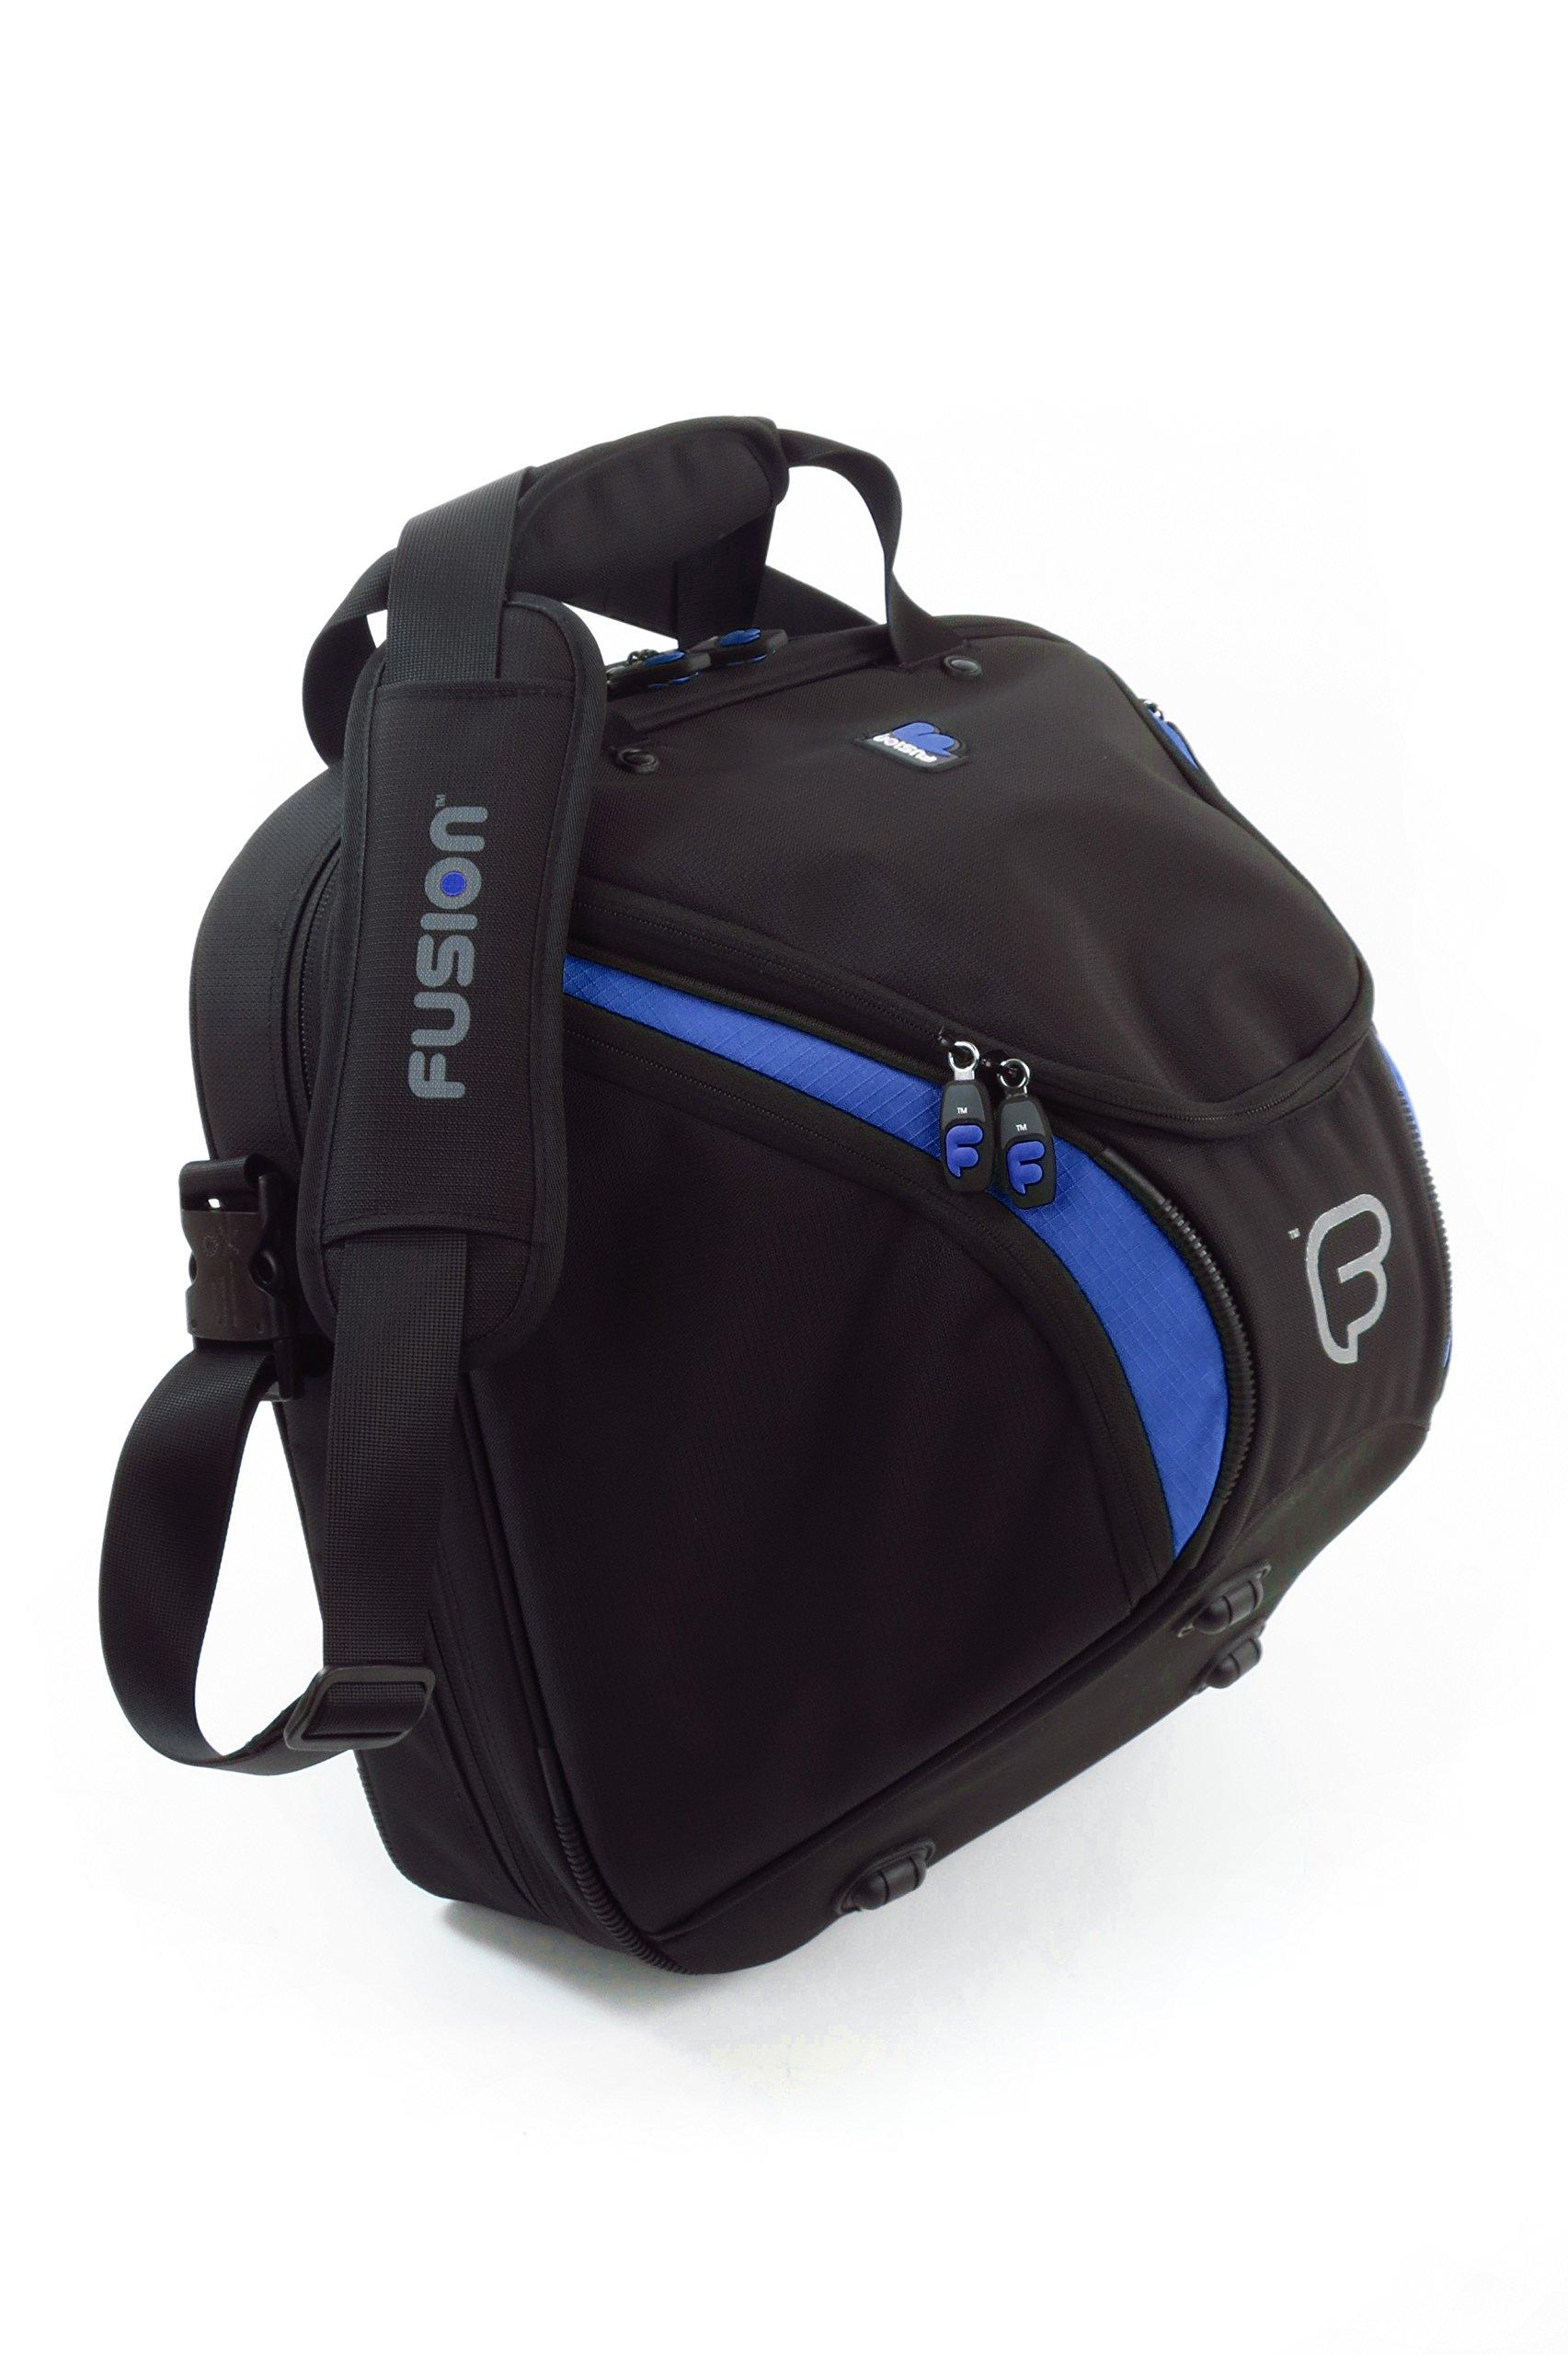 Fusion Premium Series - French Horn Gig Bag, Black/Blue